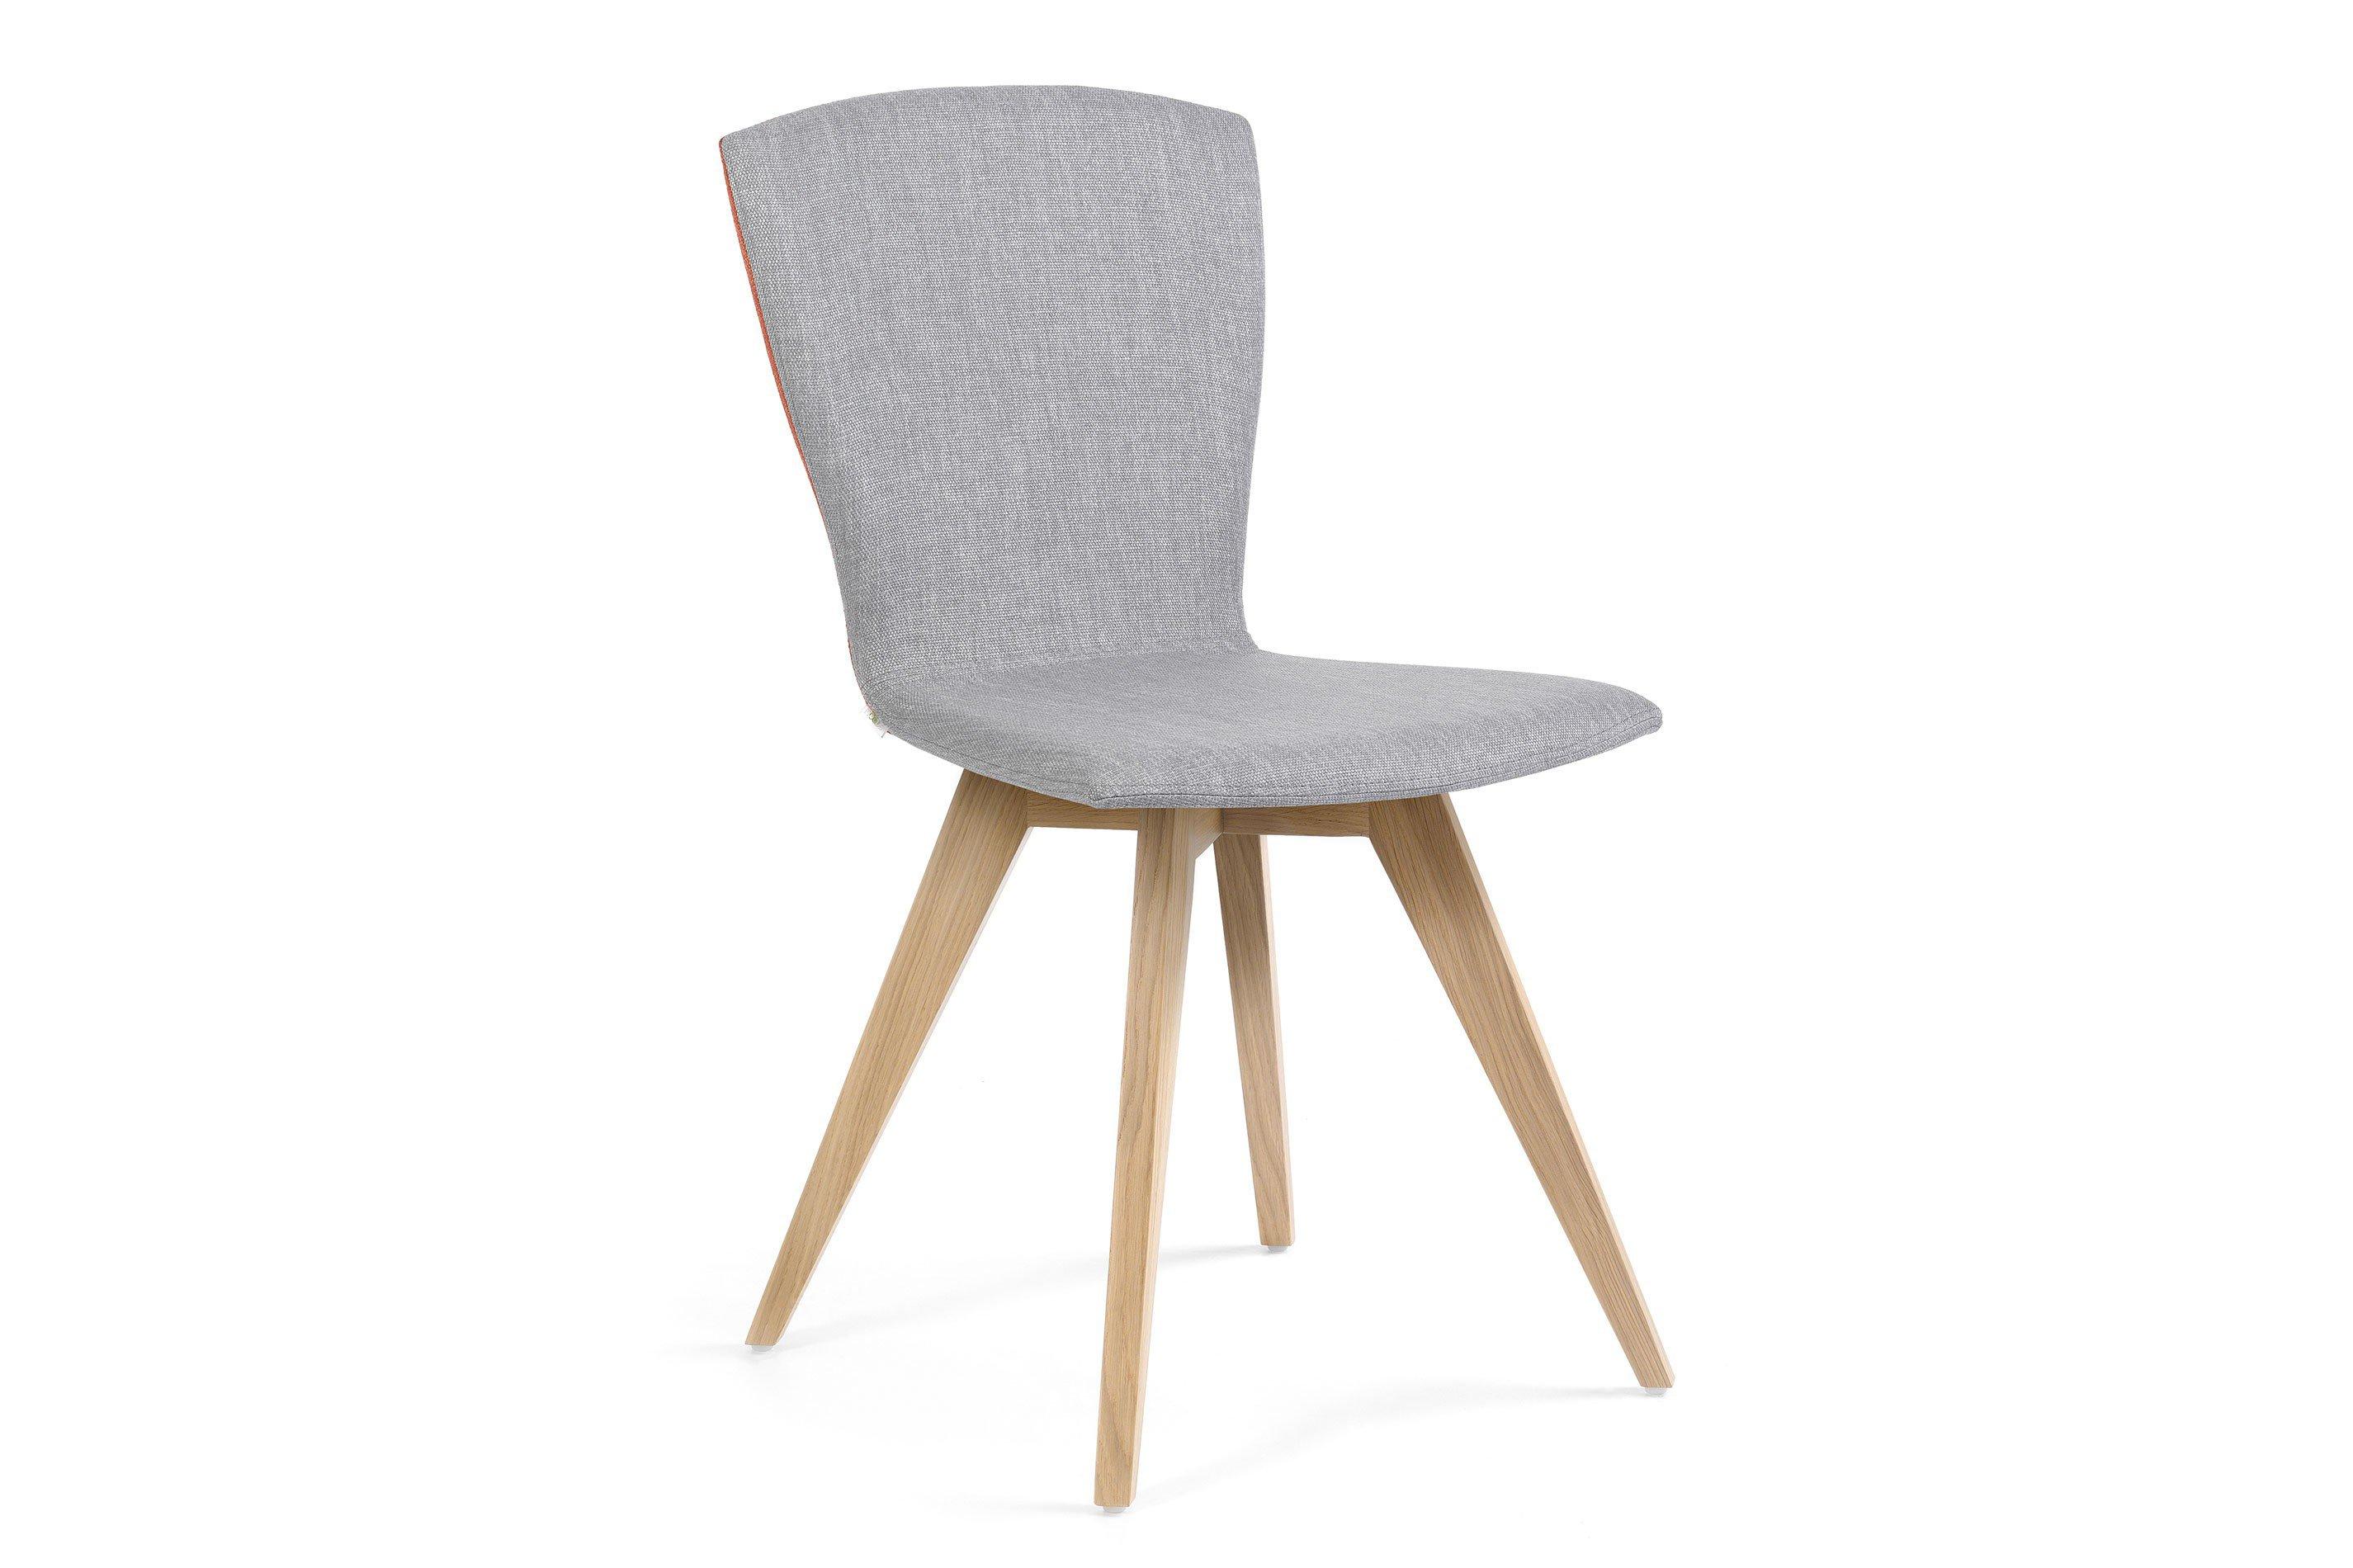 mobitec stuhl mood 21 bi zweifarbig eiche silver orange m bel letz ihr online shop. Black Bedroom Furniture Sets. Home Design Ideas